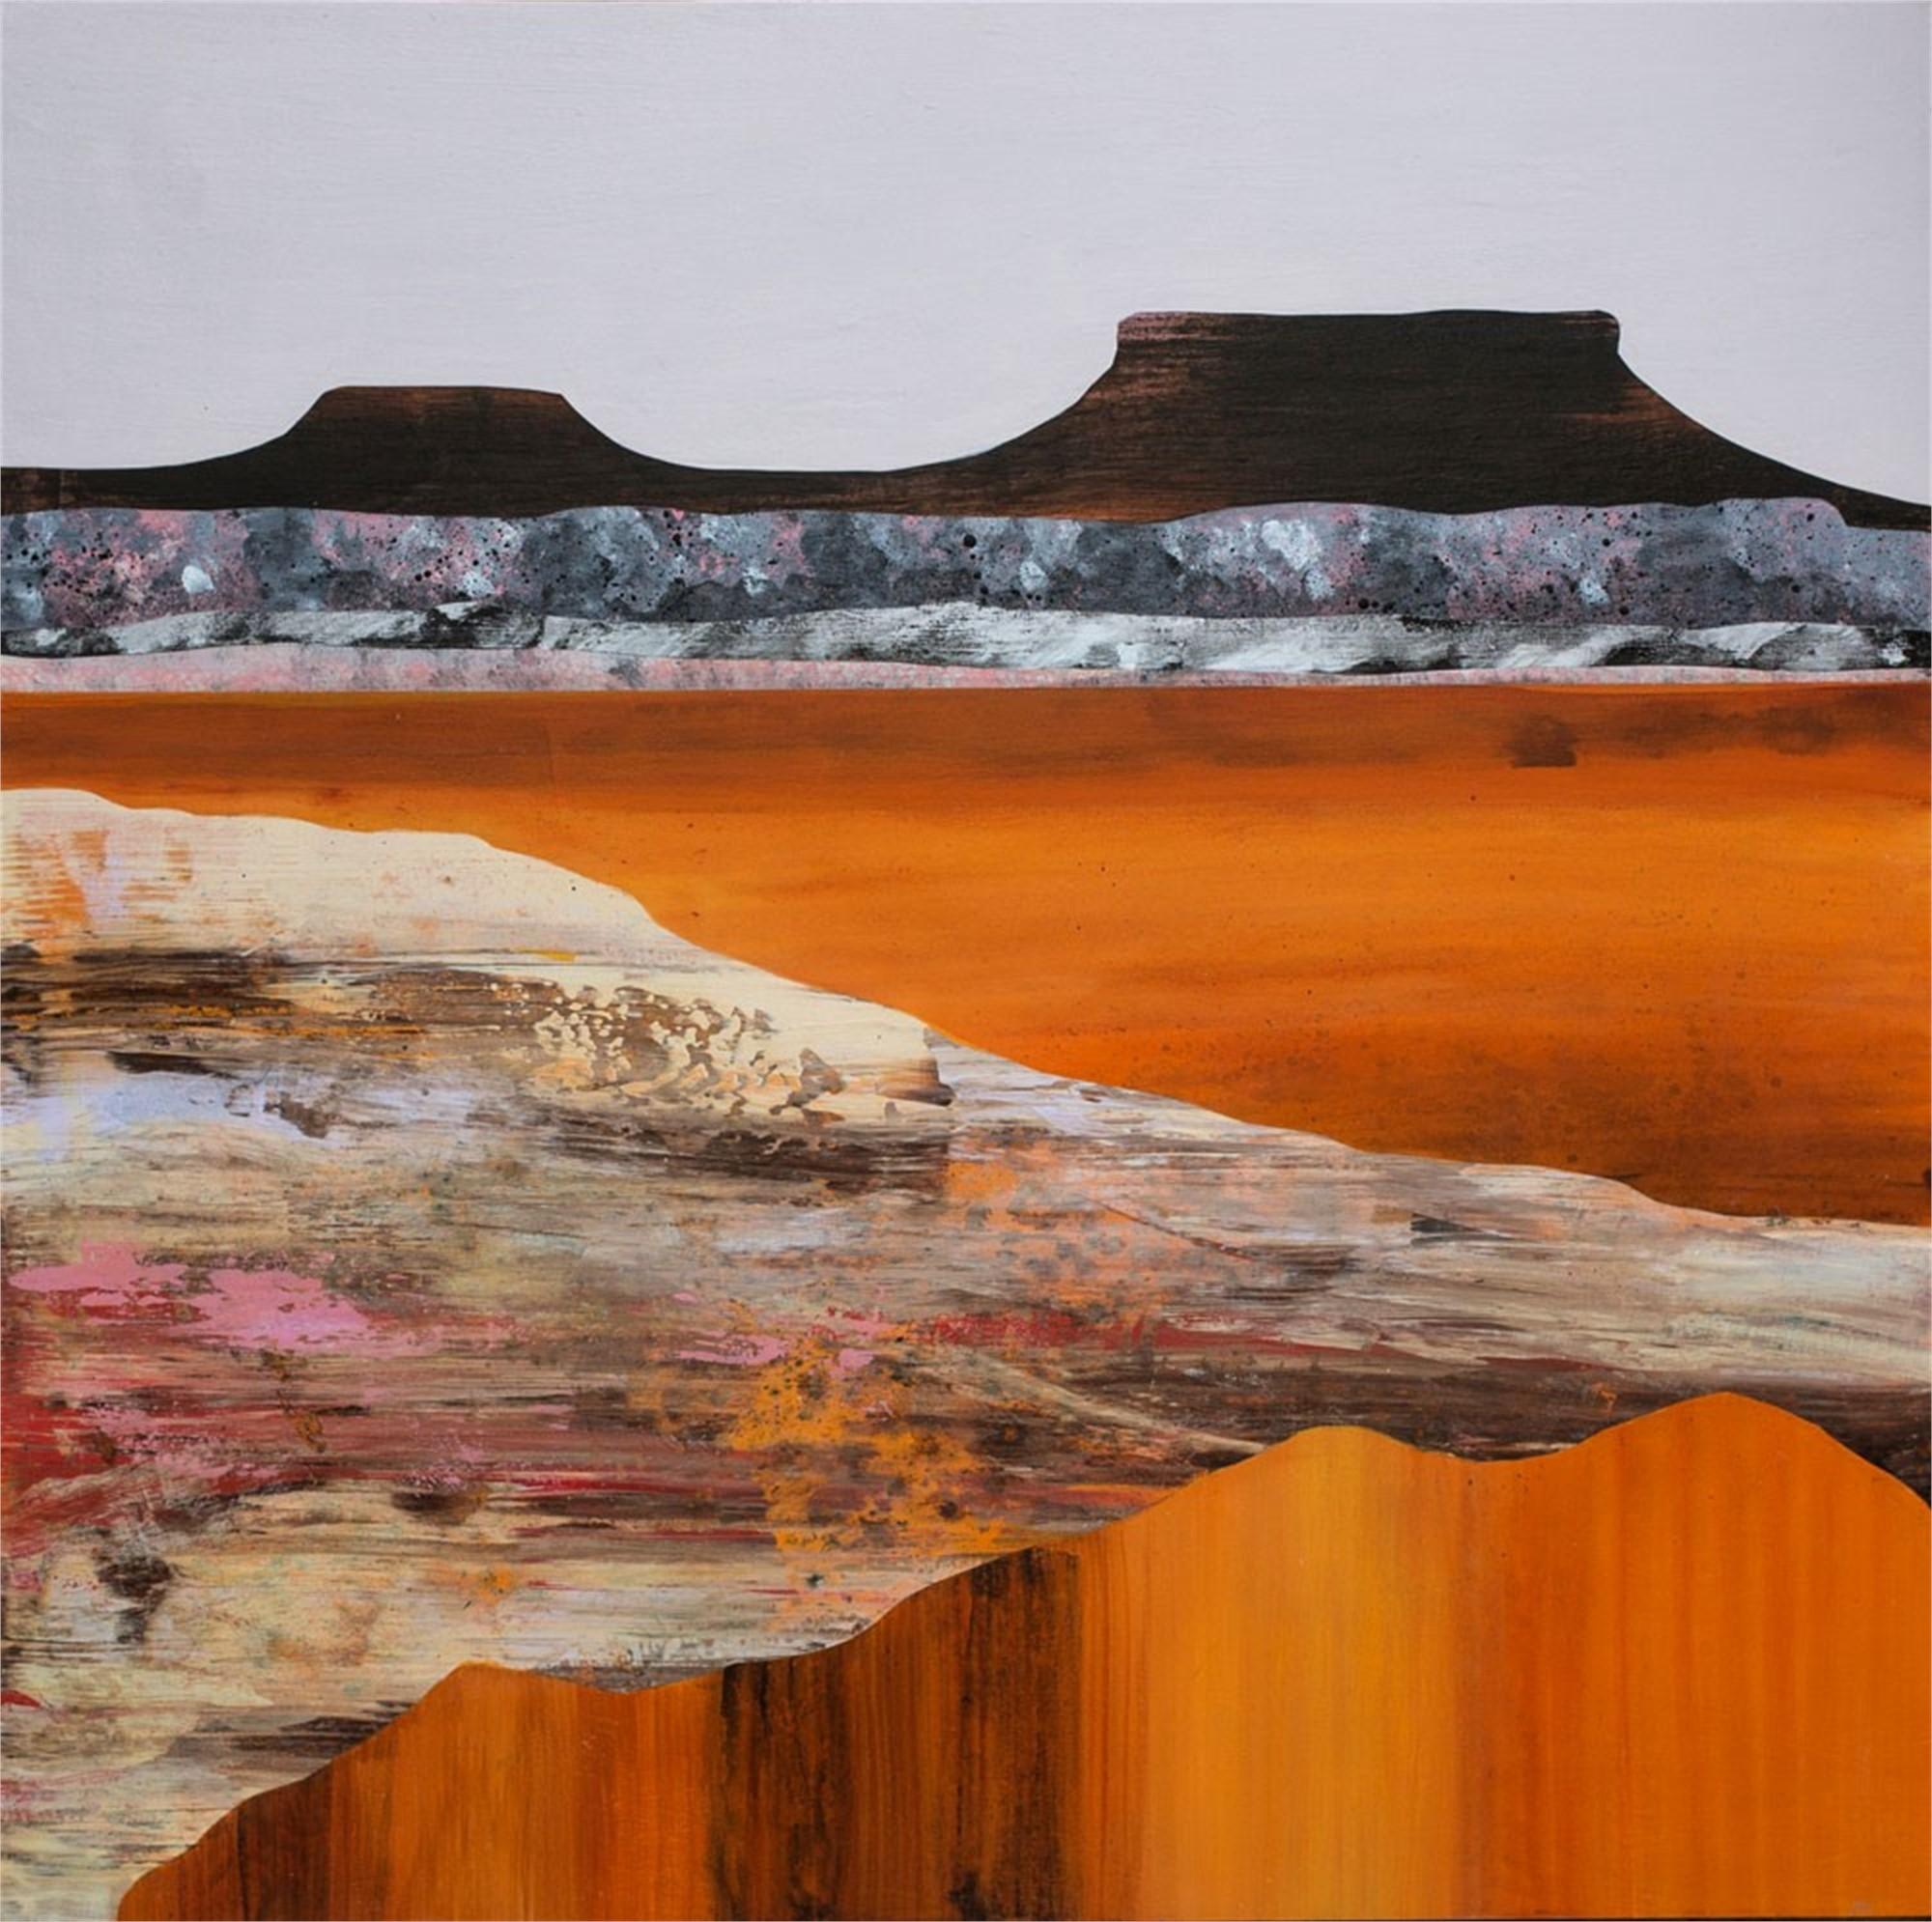 Mesa by Sarah Winkler